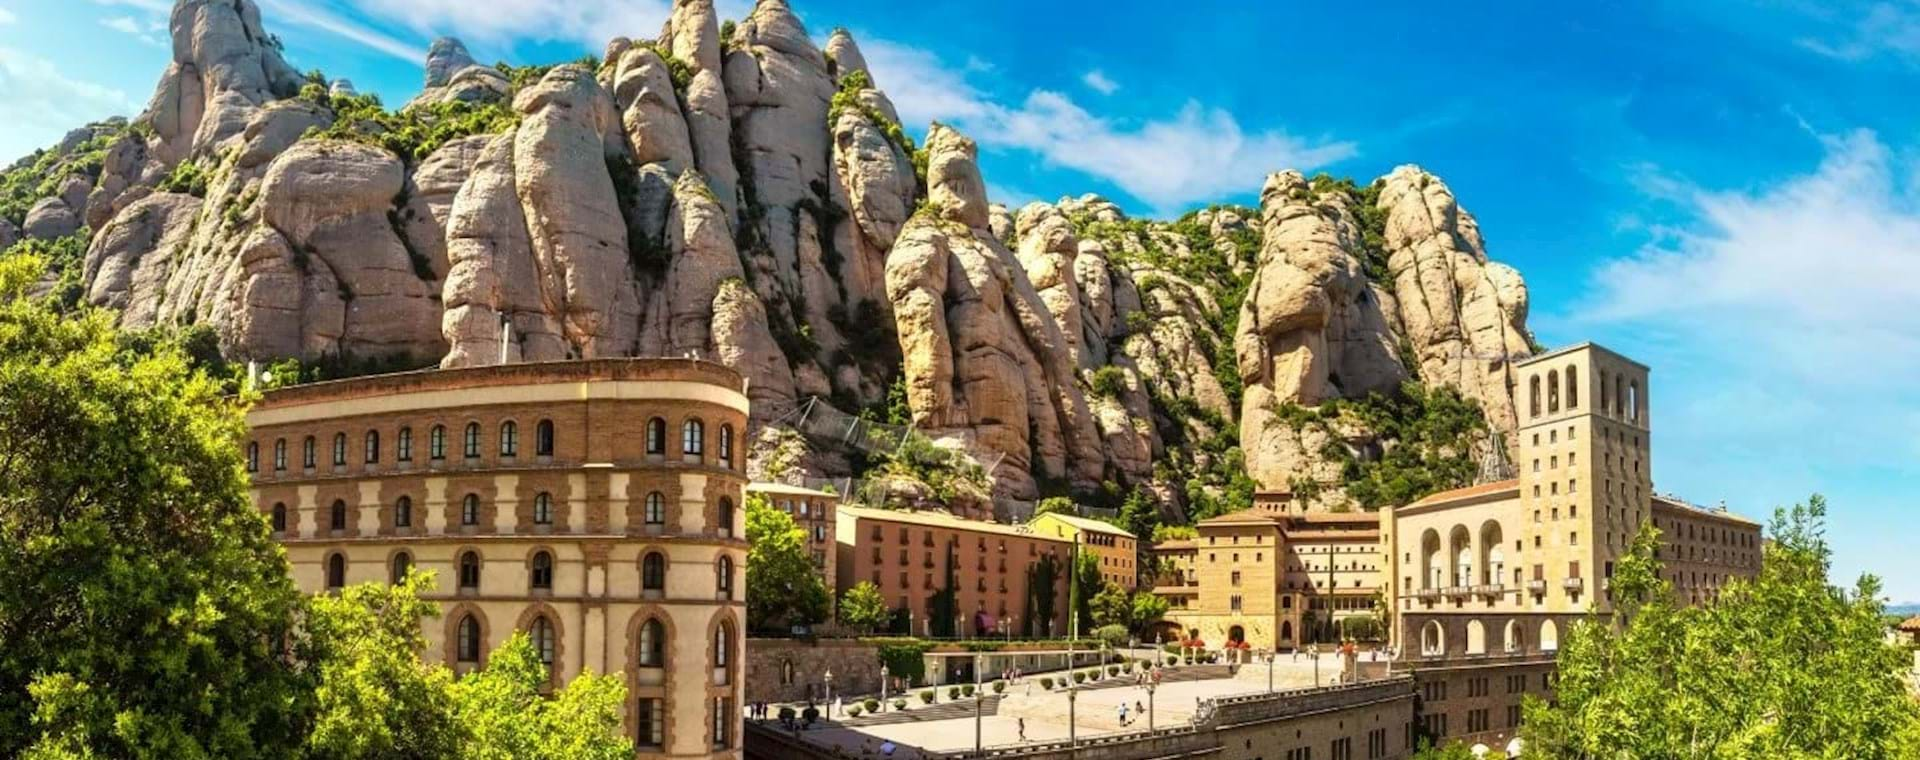 Full-Day Combo: Early-Morning Montserrat & Sagrada Família Express